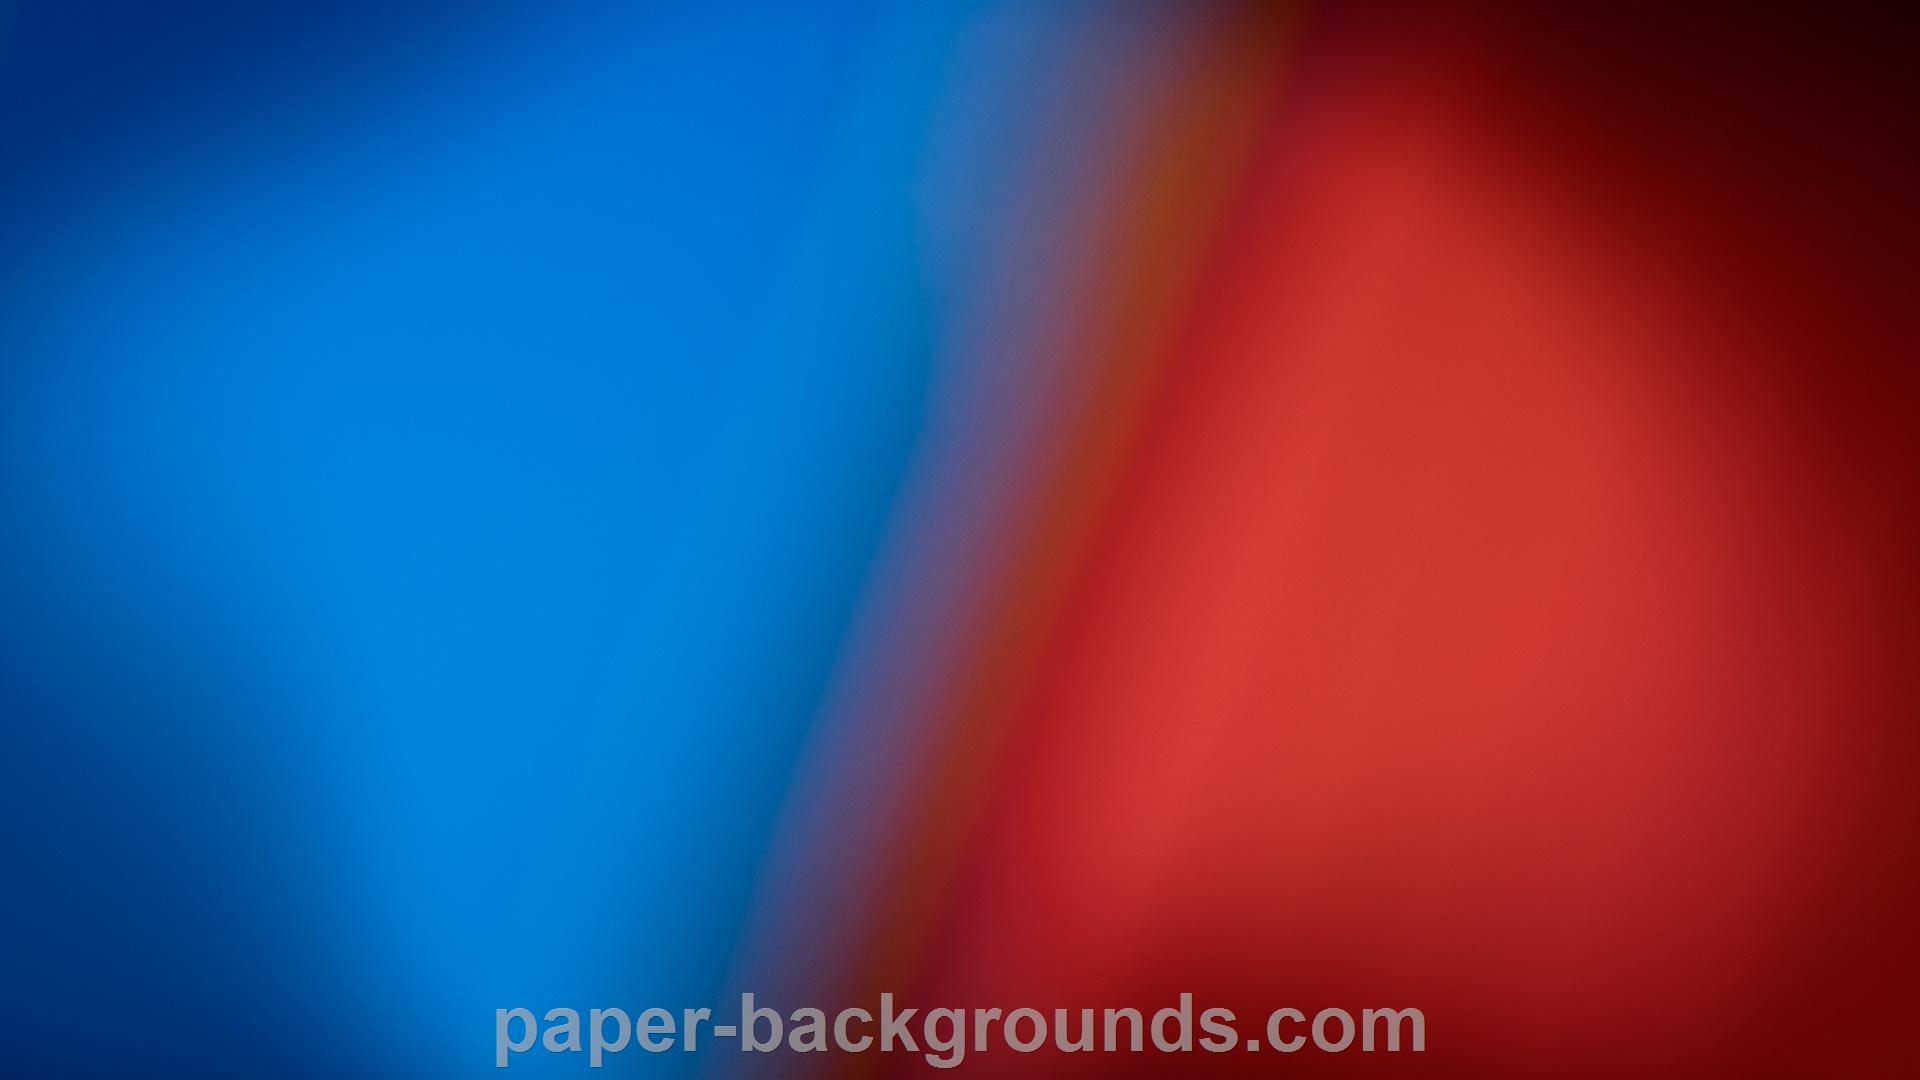 Red Vs Blue Wallpaper 1280x1024